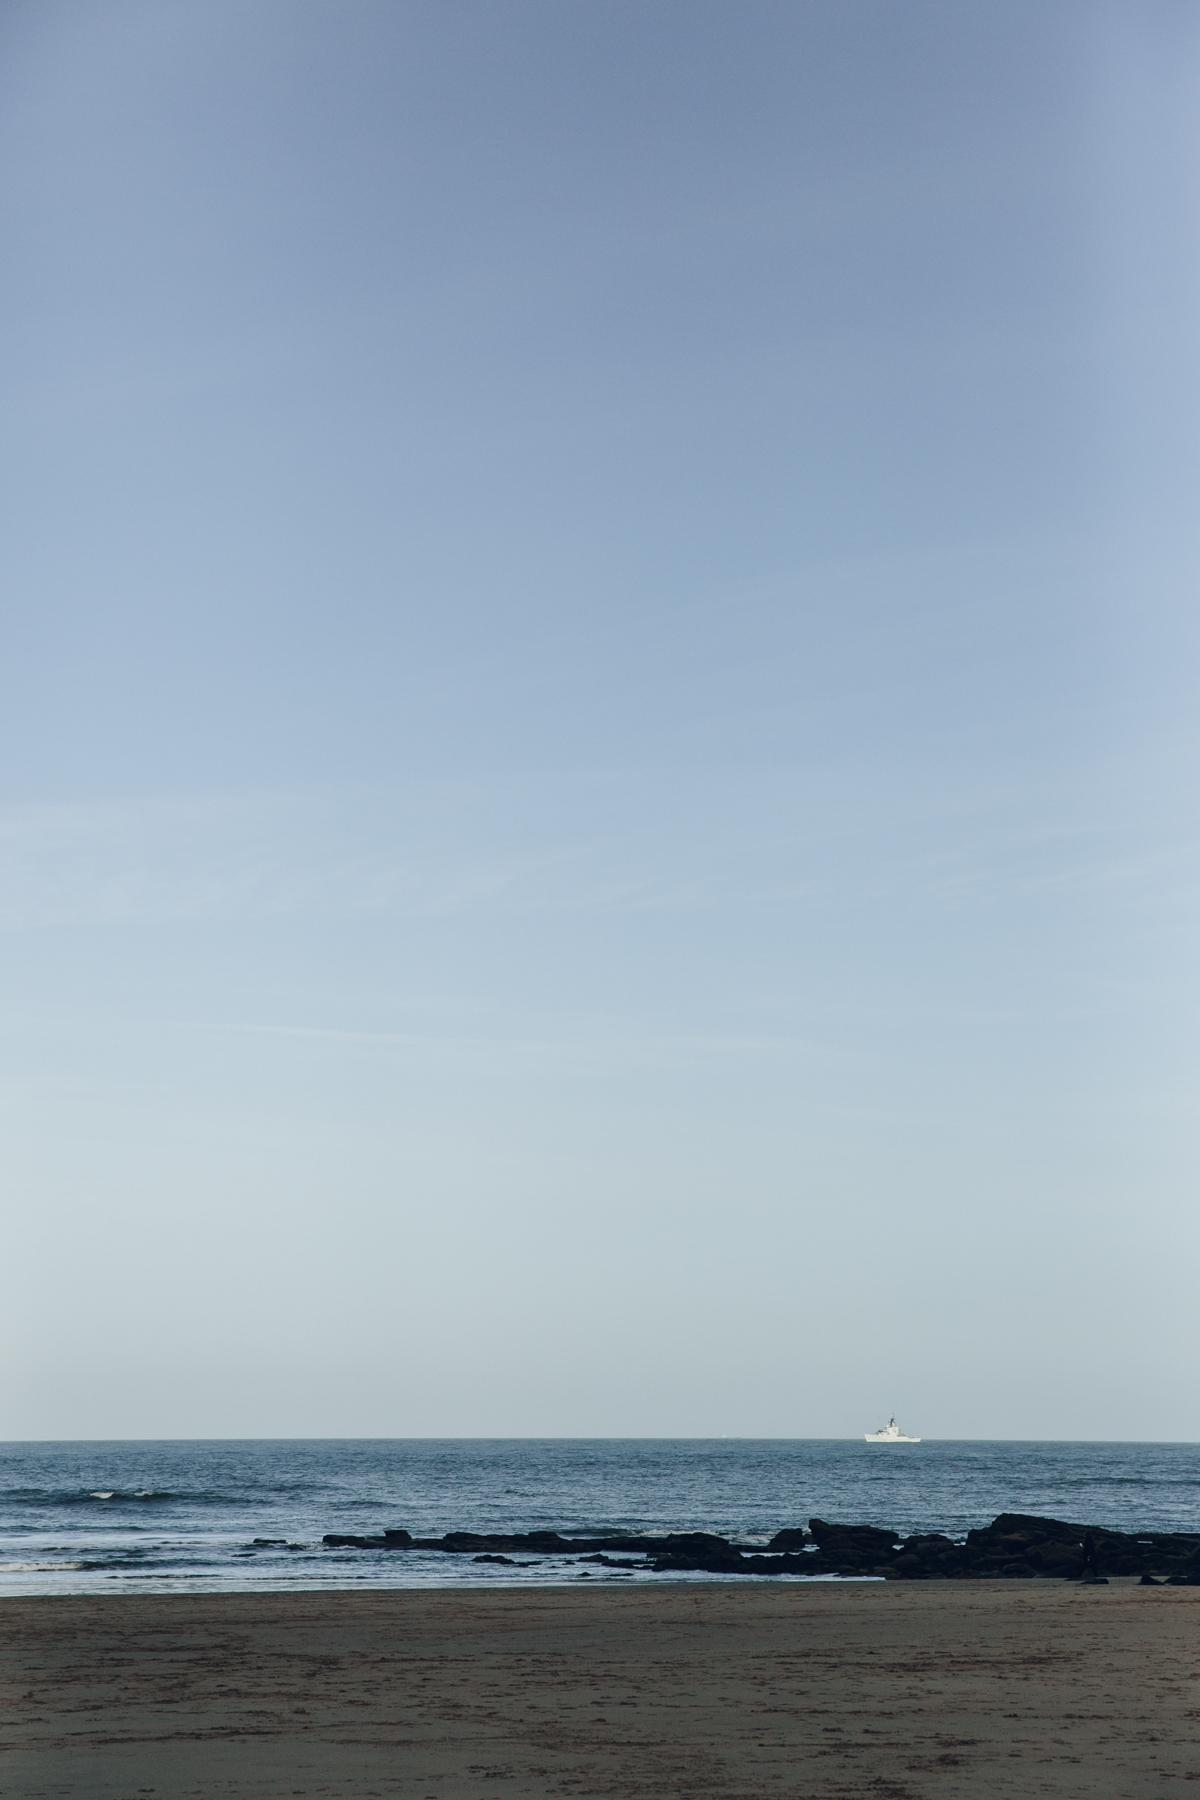 Ship on the horizon at Tynemouth.